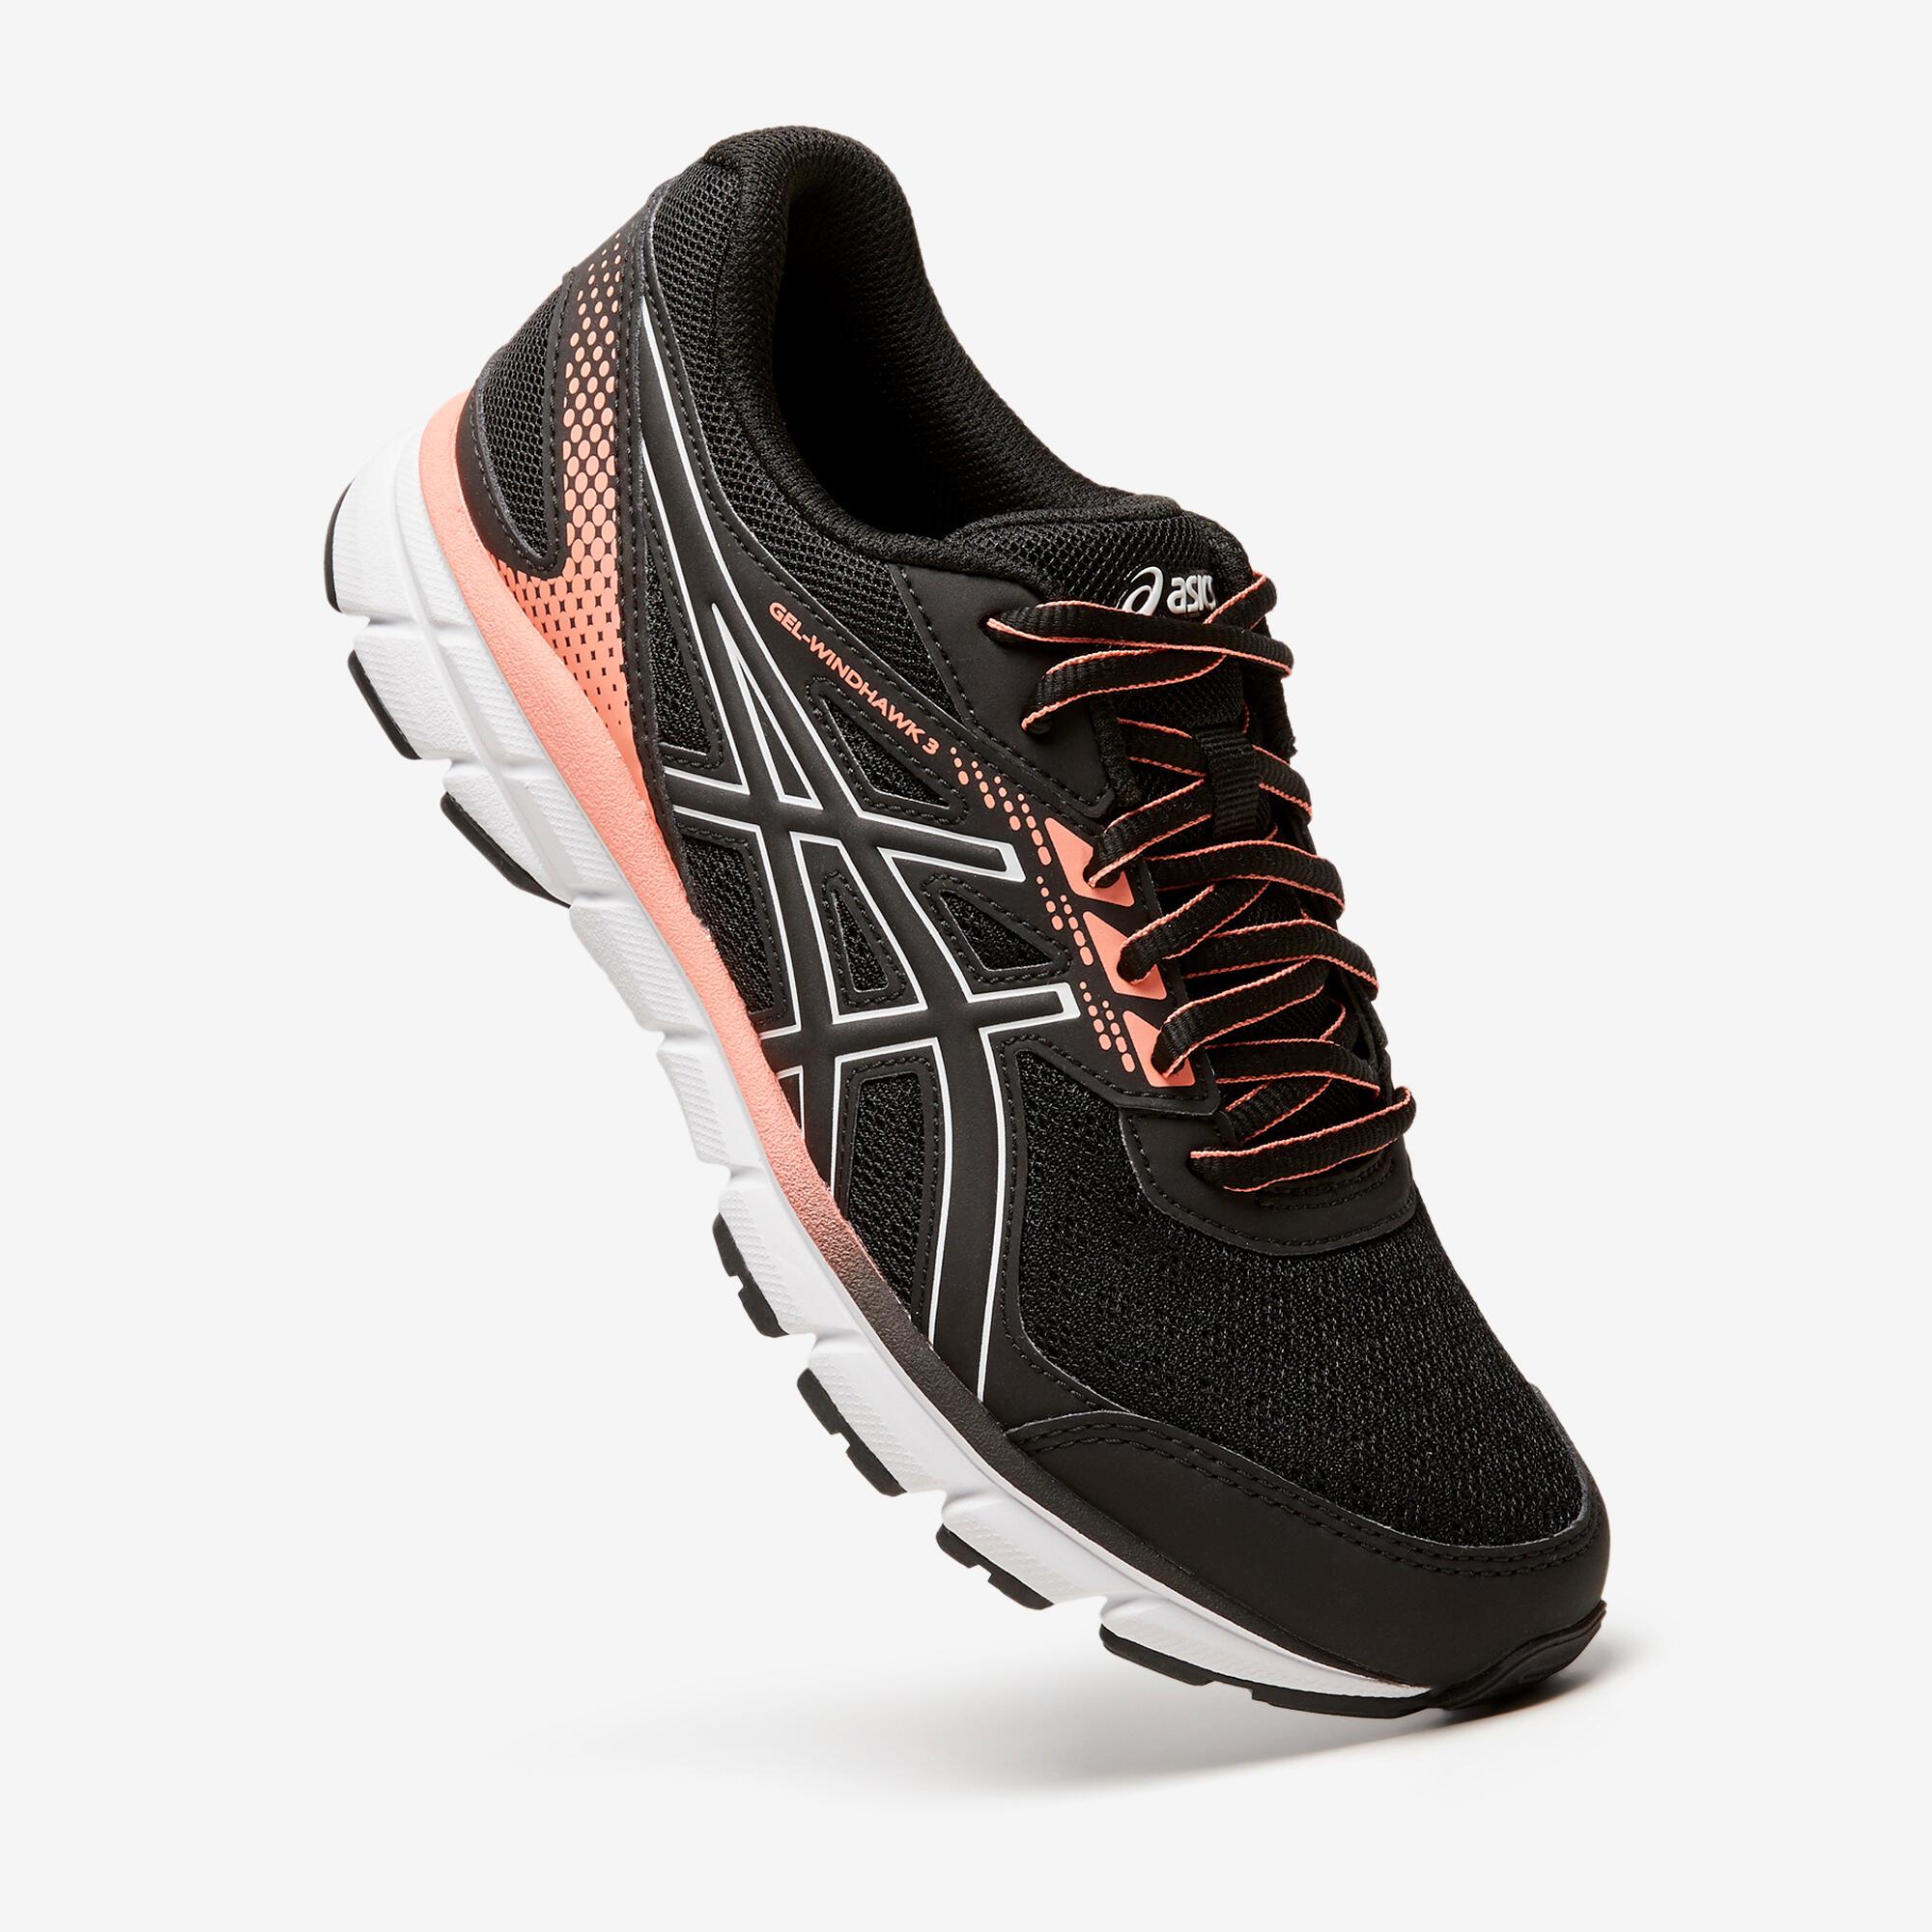 Asics Gel Windhawk 21 Women's Running Shoes